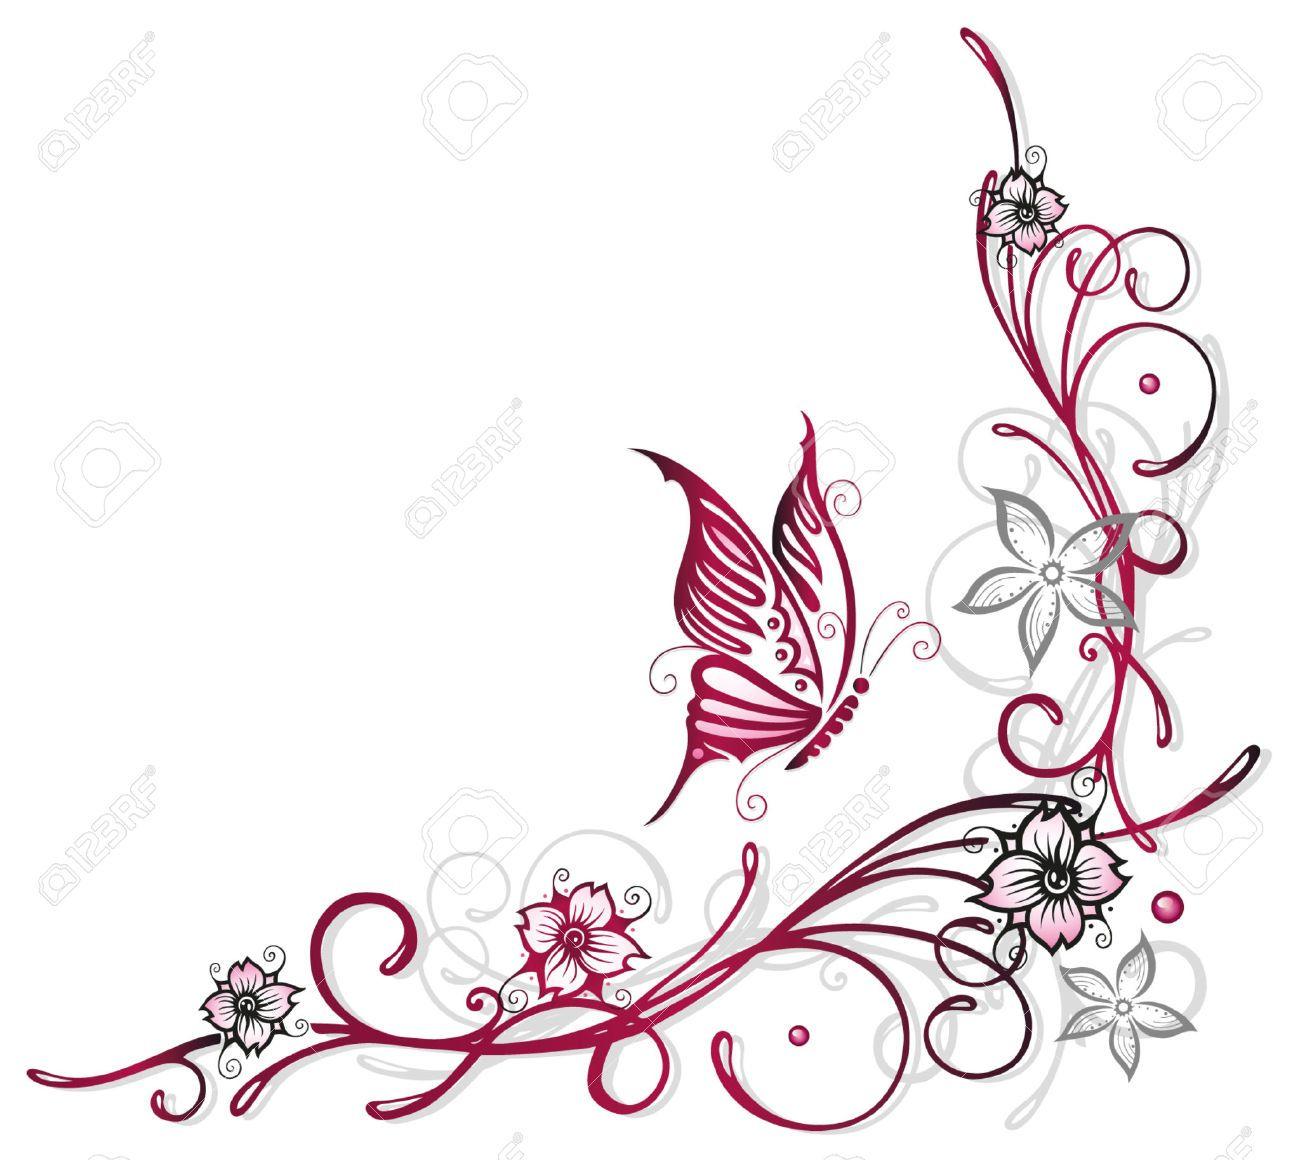 tatuajes con flor de cerezos - Buscar con Google ...